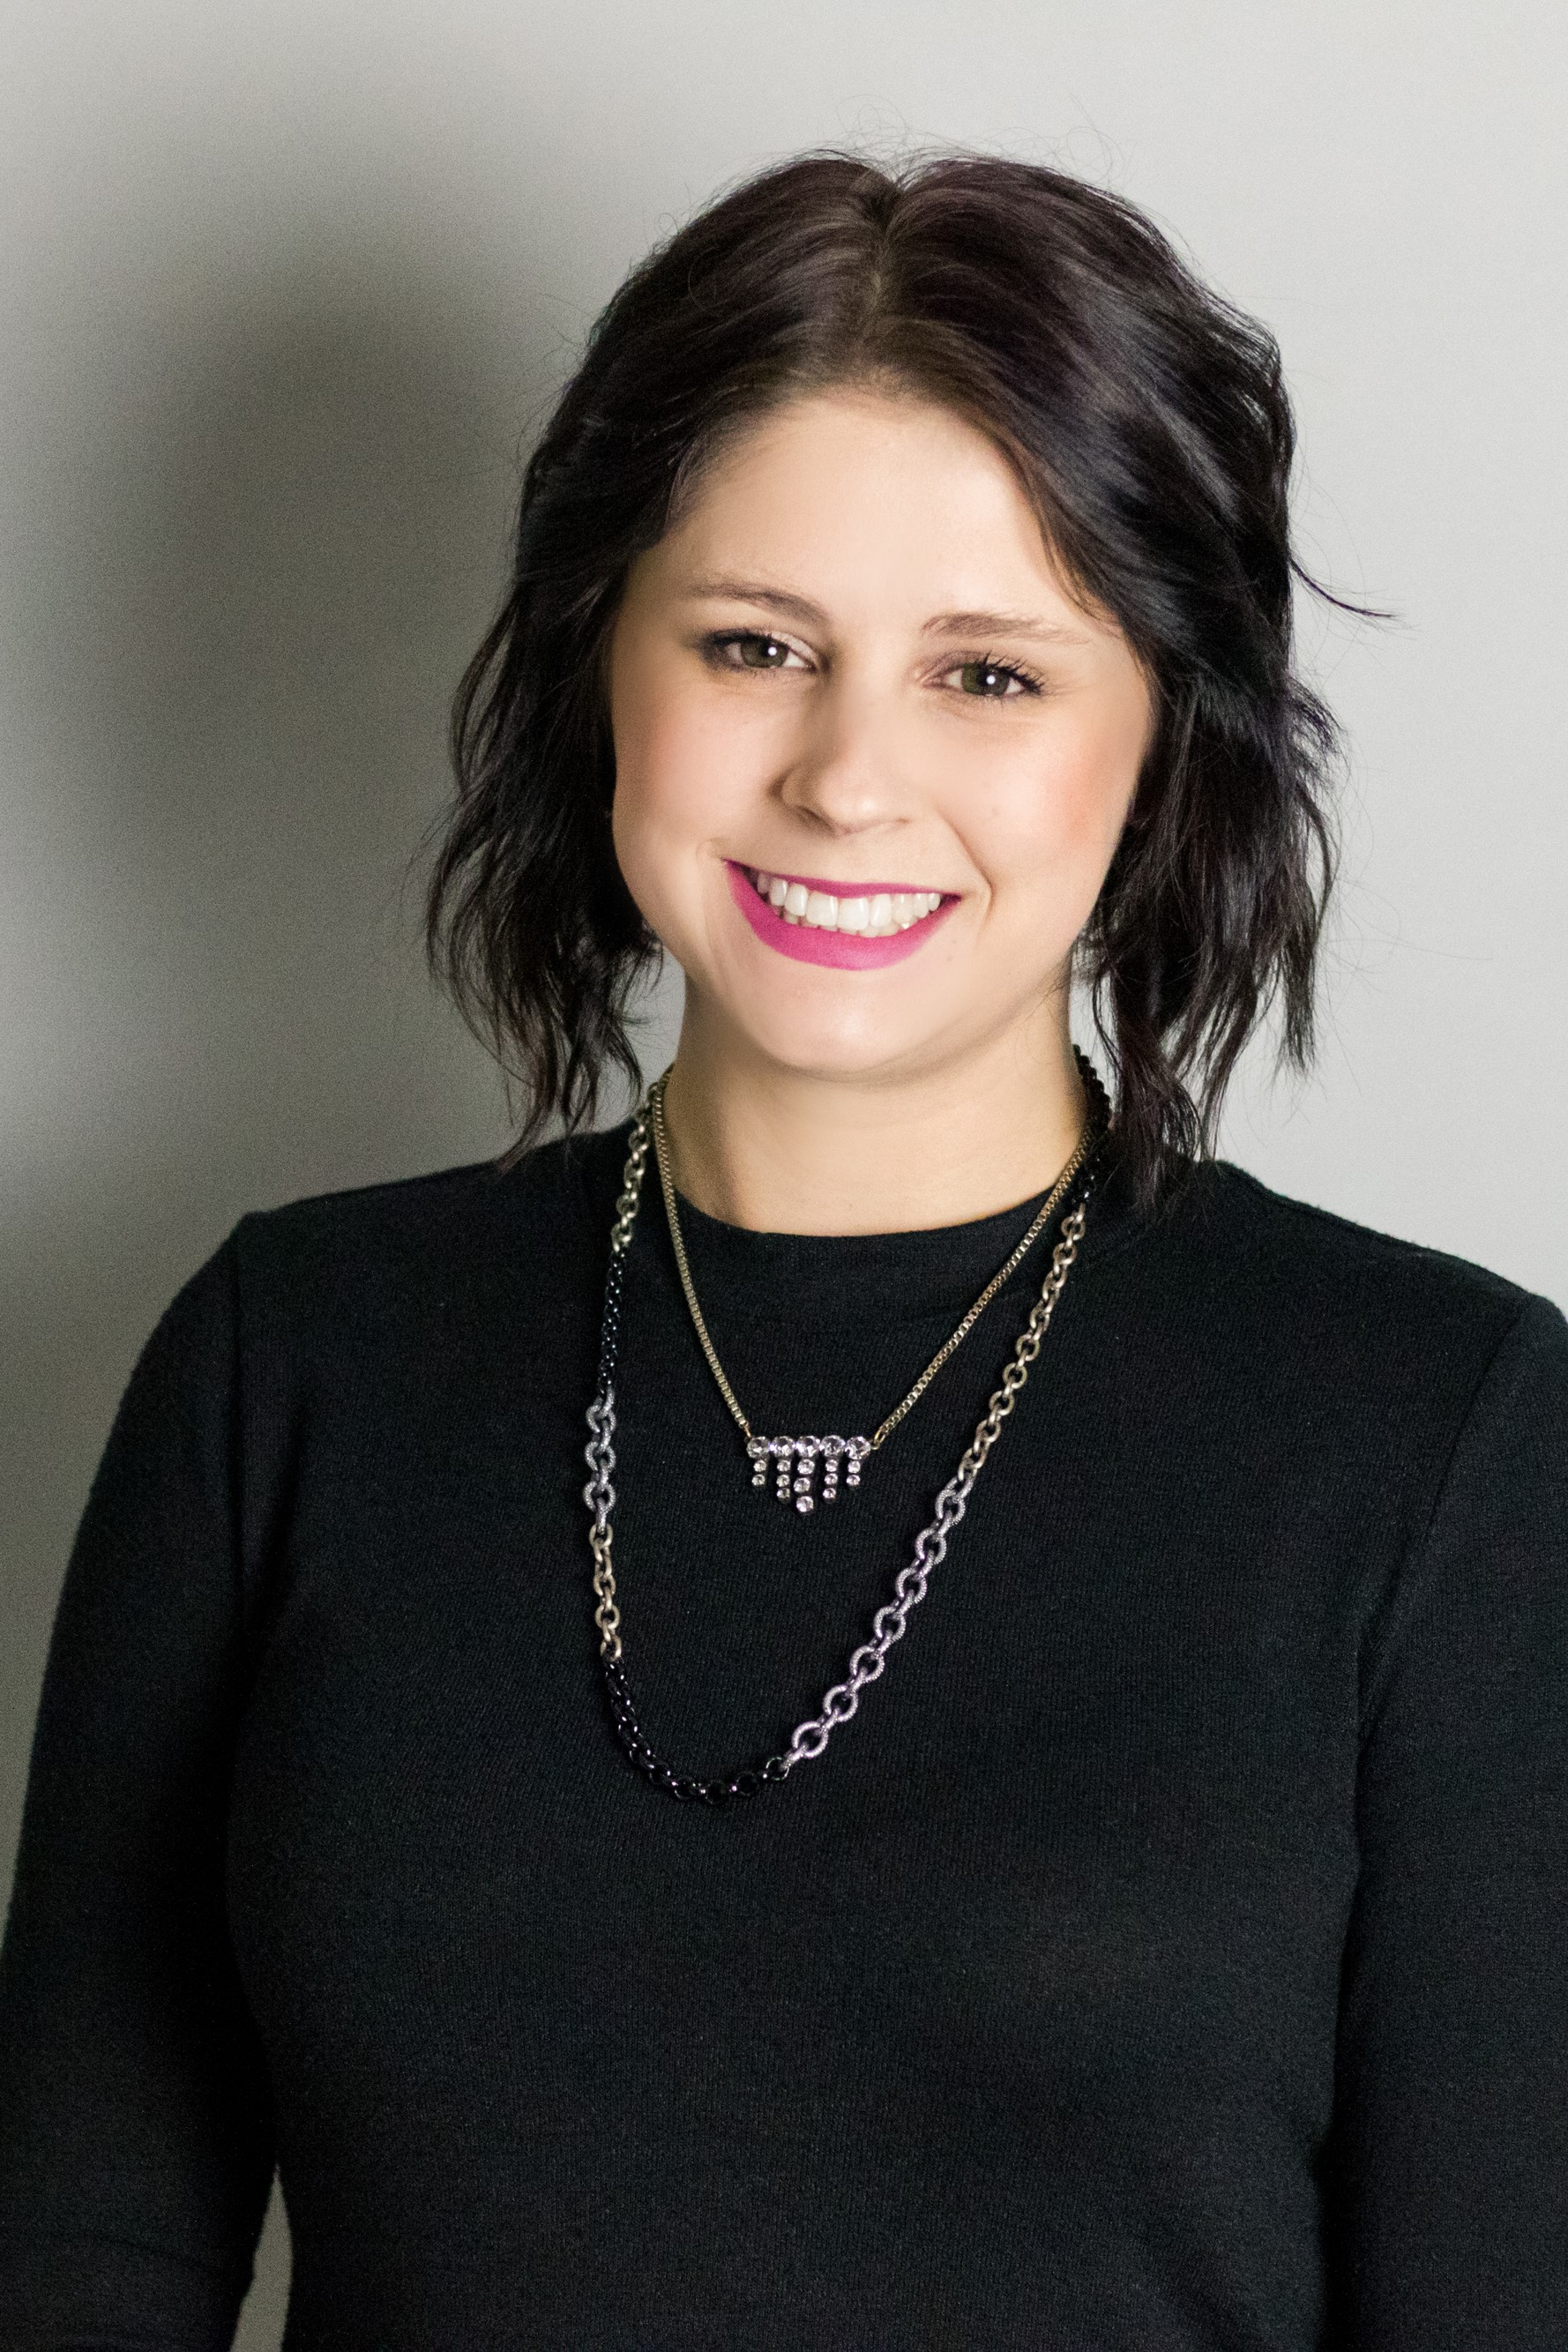 Paige LaBrozzi